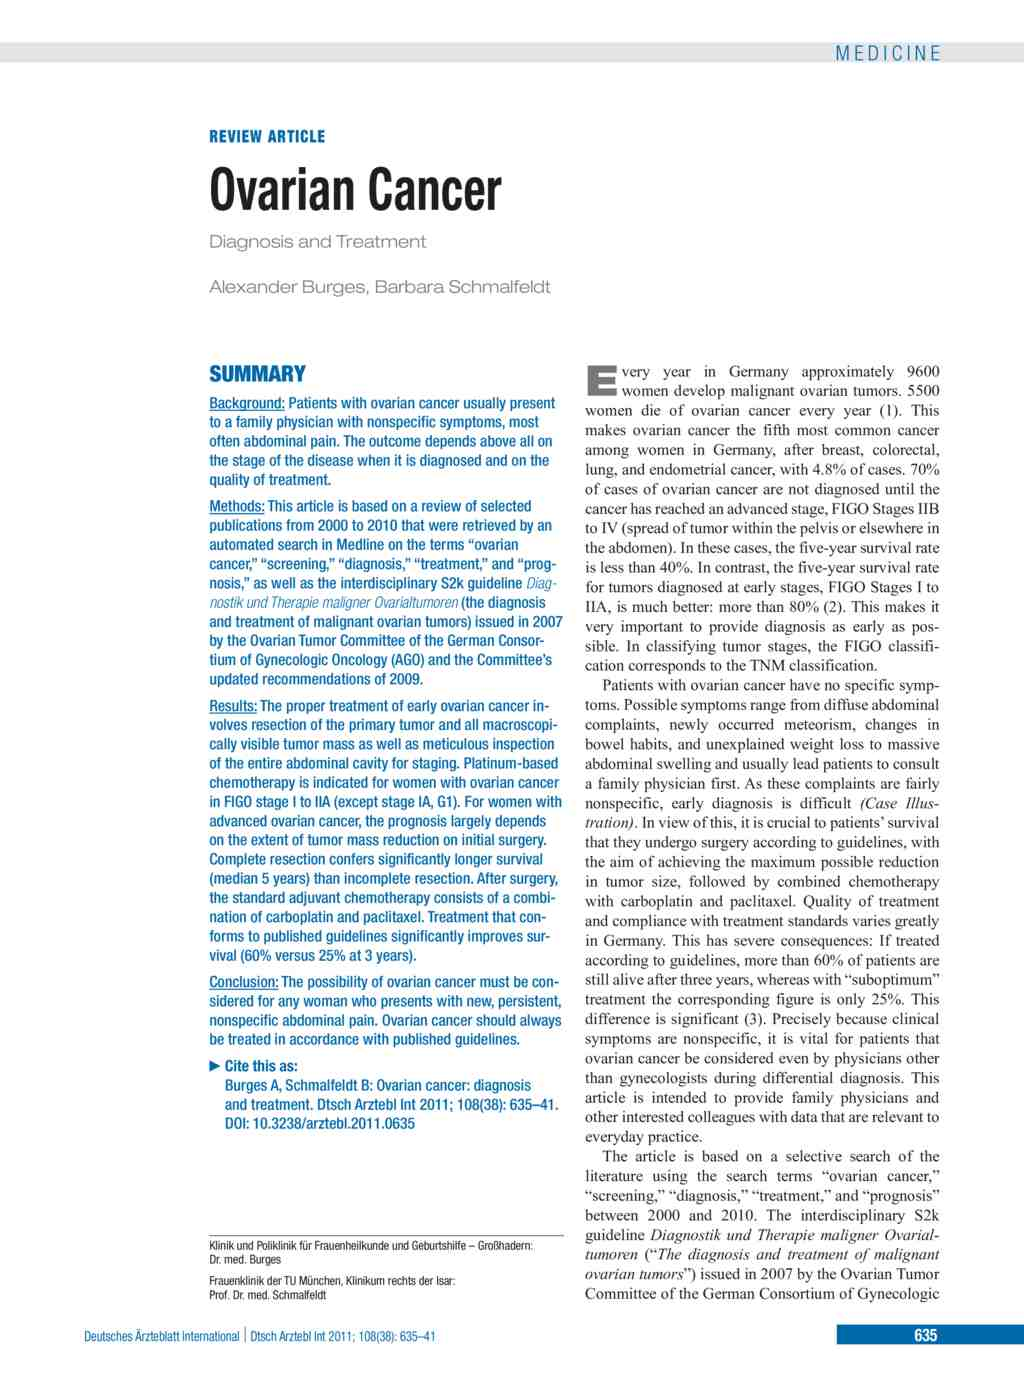 Ovarian Cancer 23 09 2011